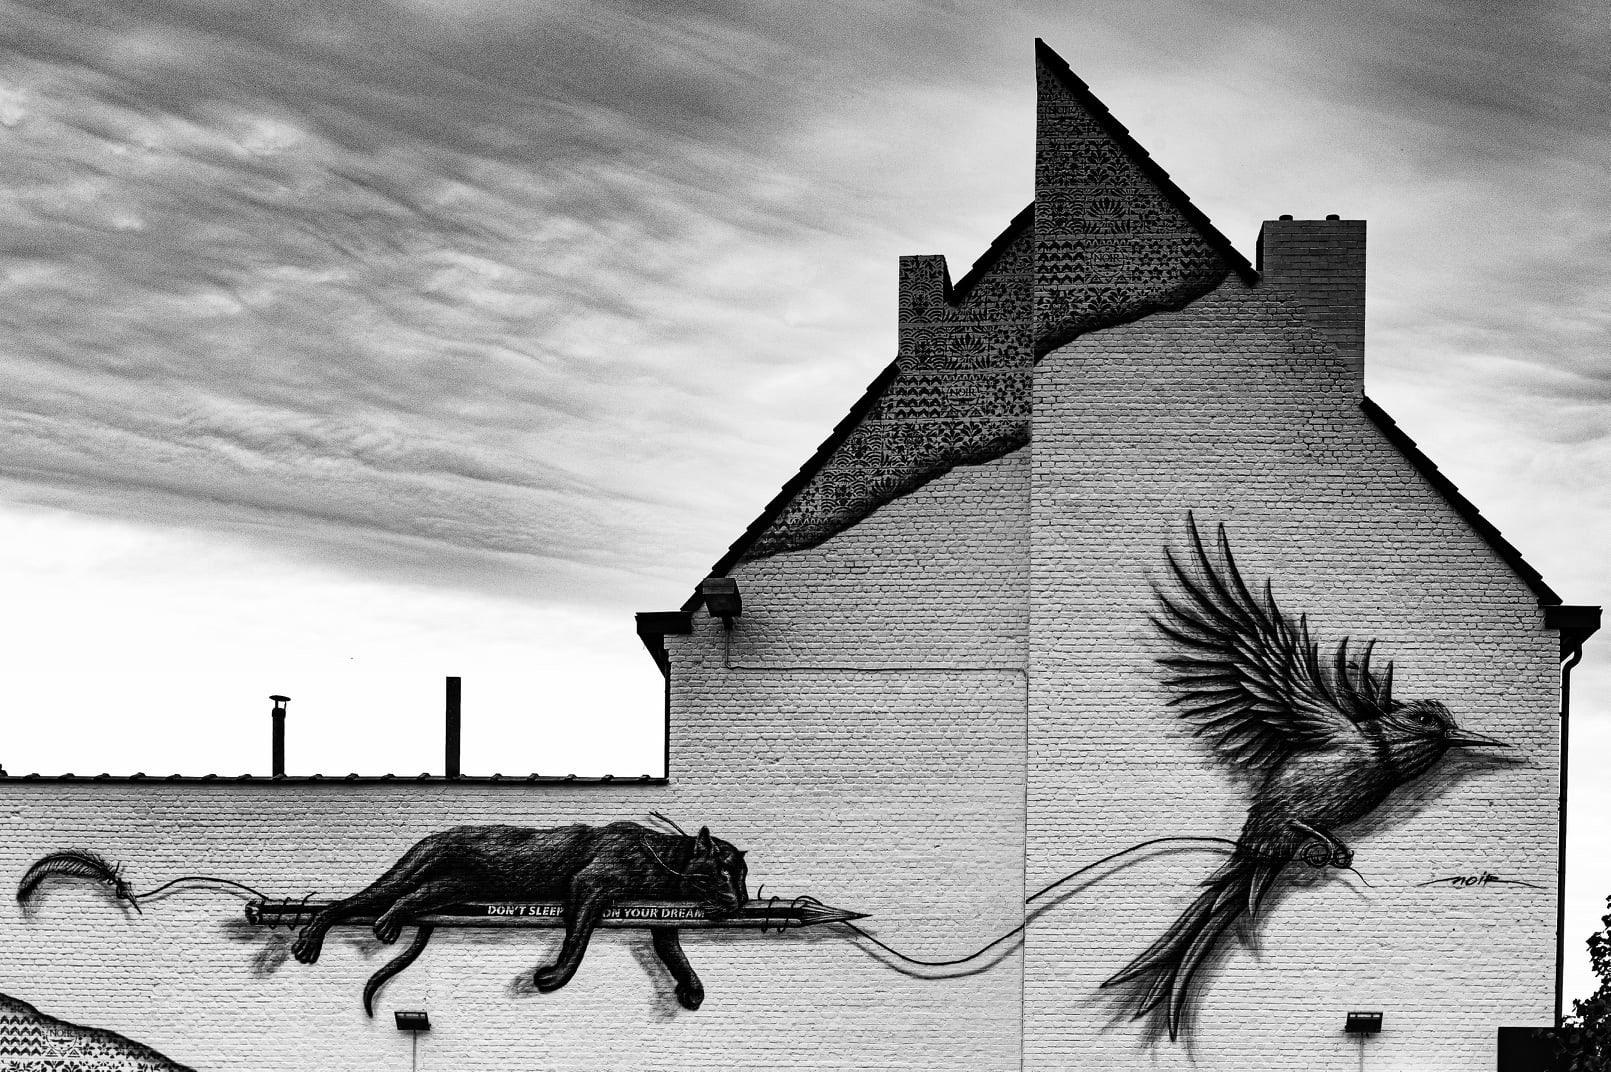 Belgium - Street art by NOIR in Mons